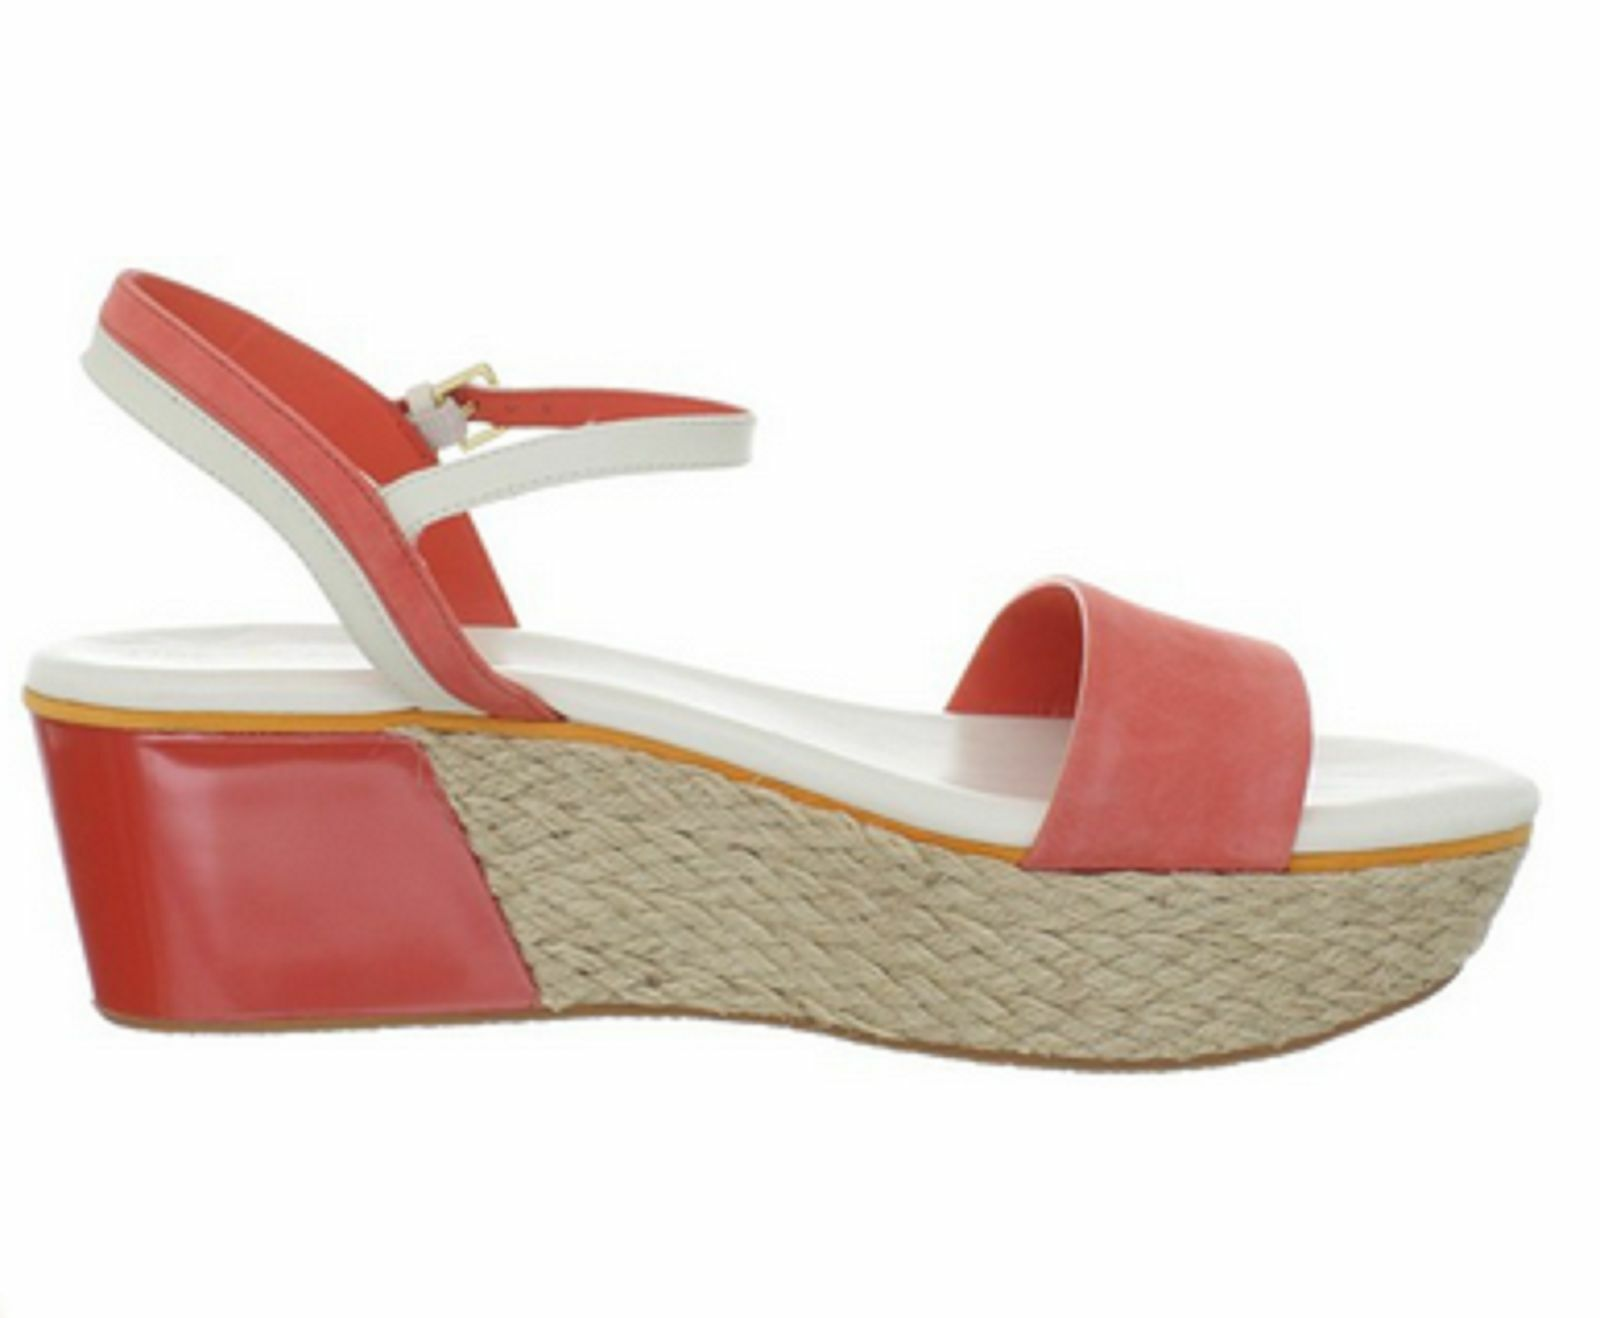 Cole Haan Donna  Arden Platform Wedge Sandal Dimensione 9.5B 9.5B 9.5B US 696bb4